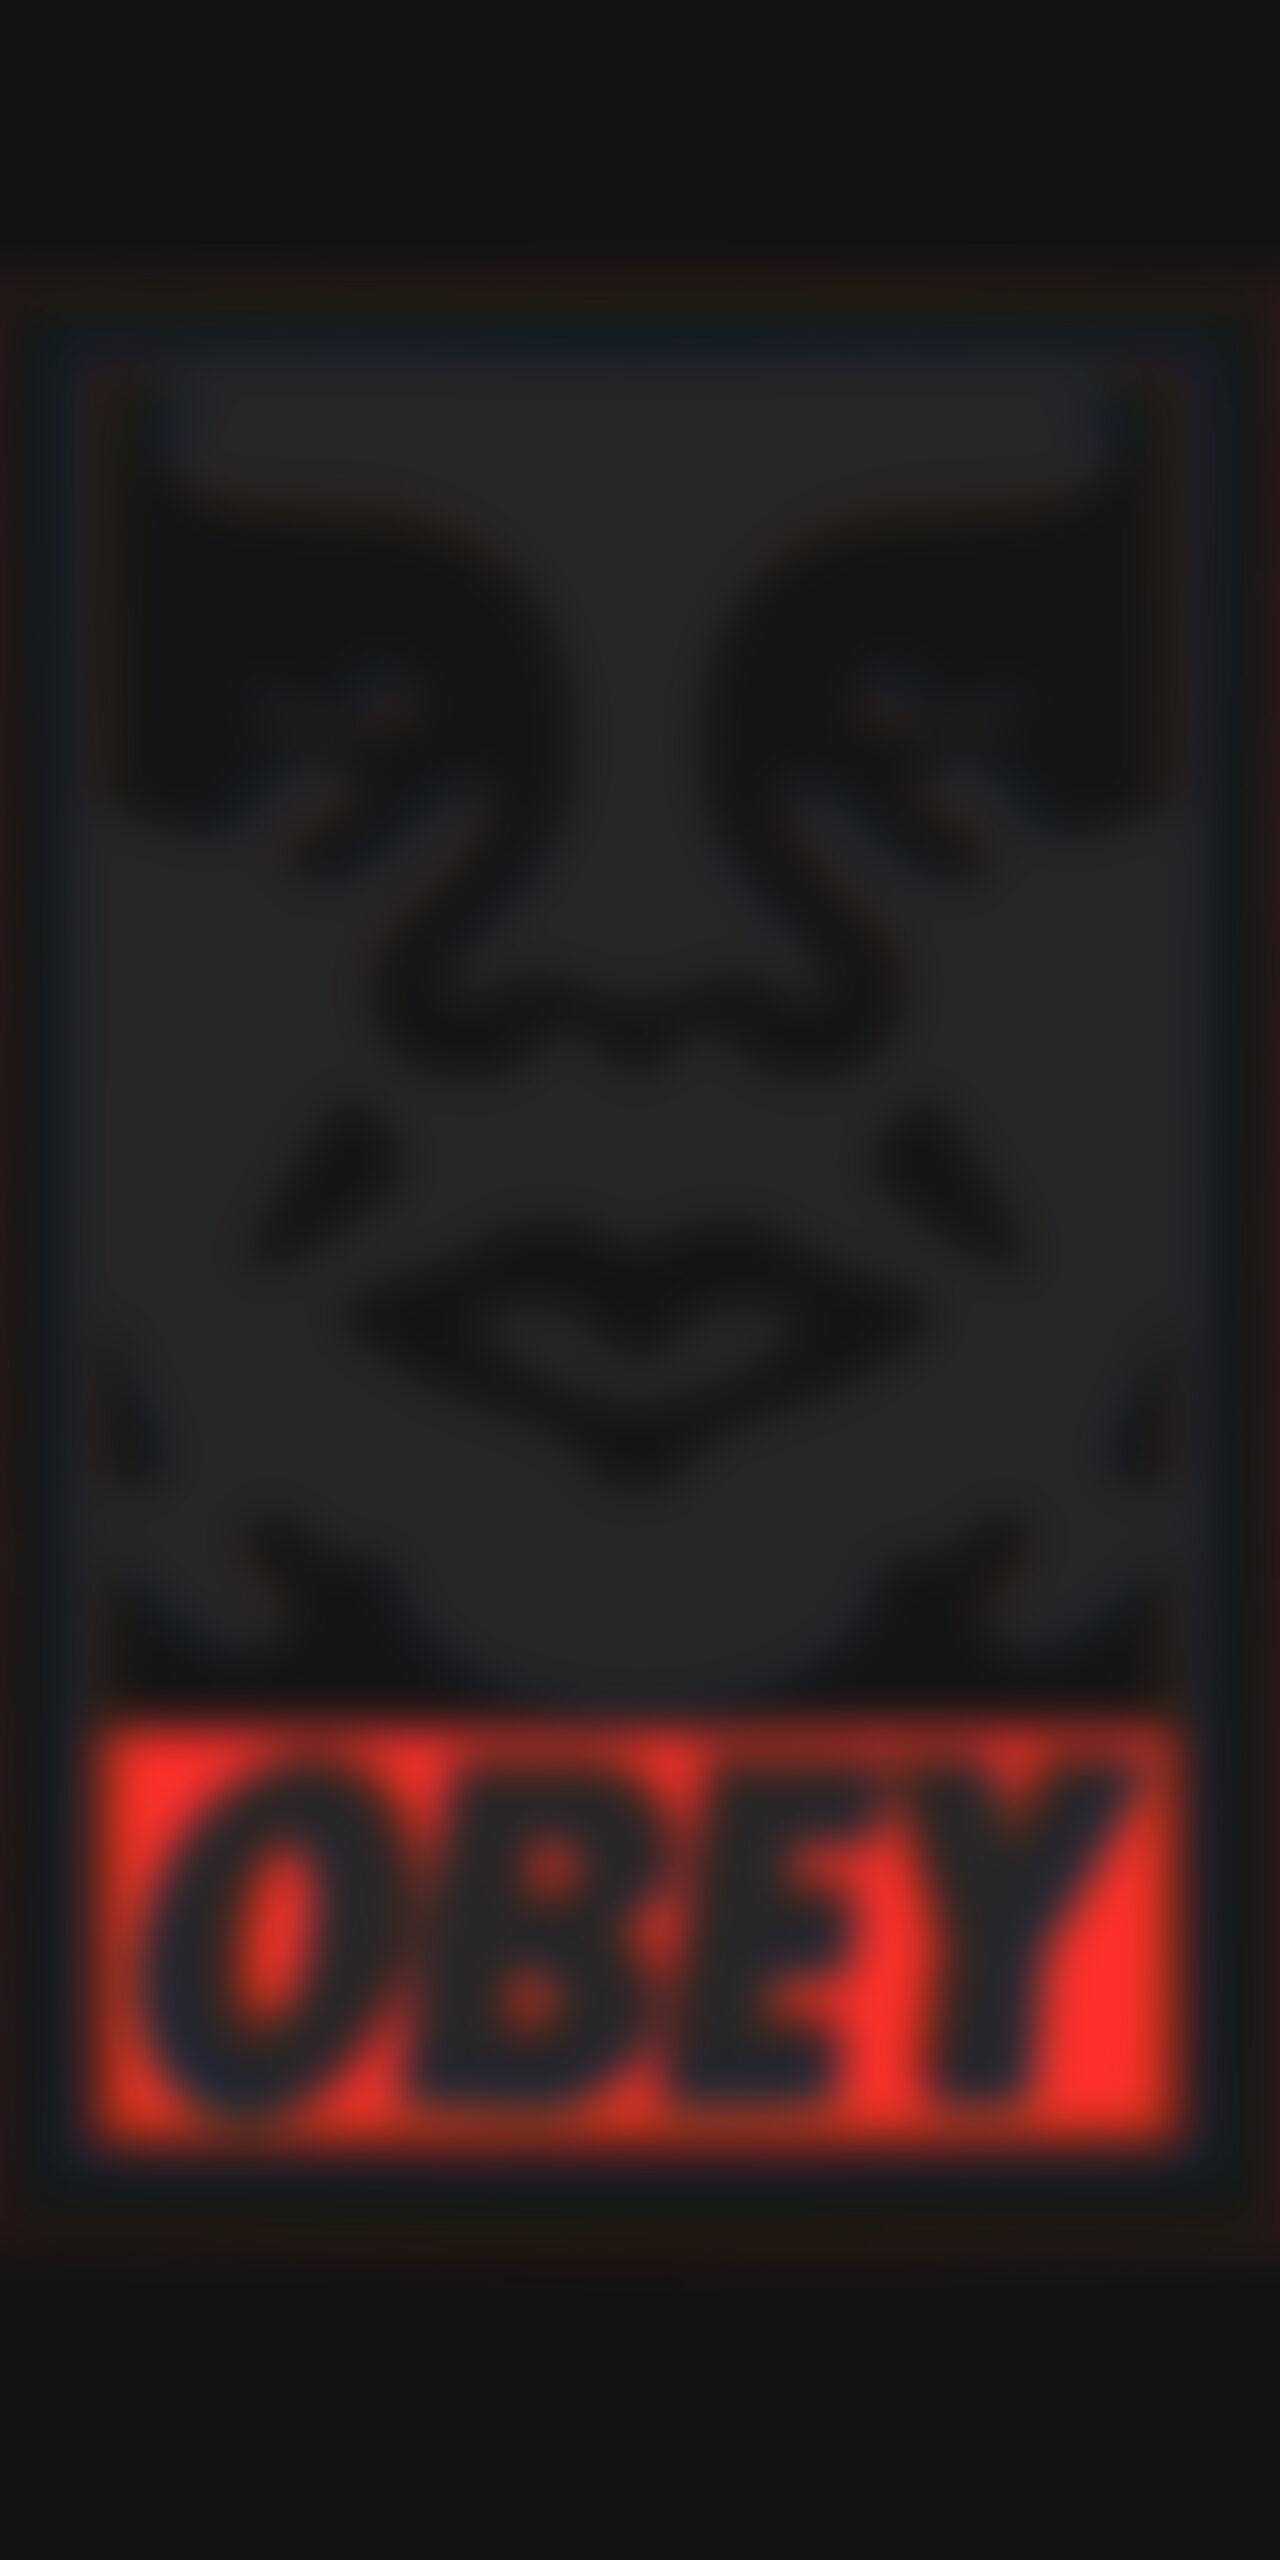 obey dark blur wallpaper